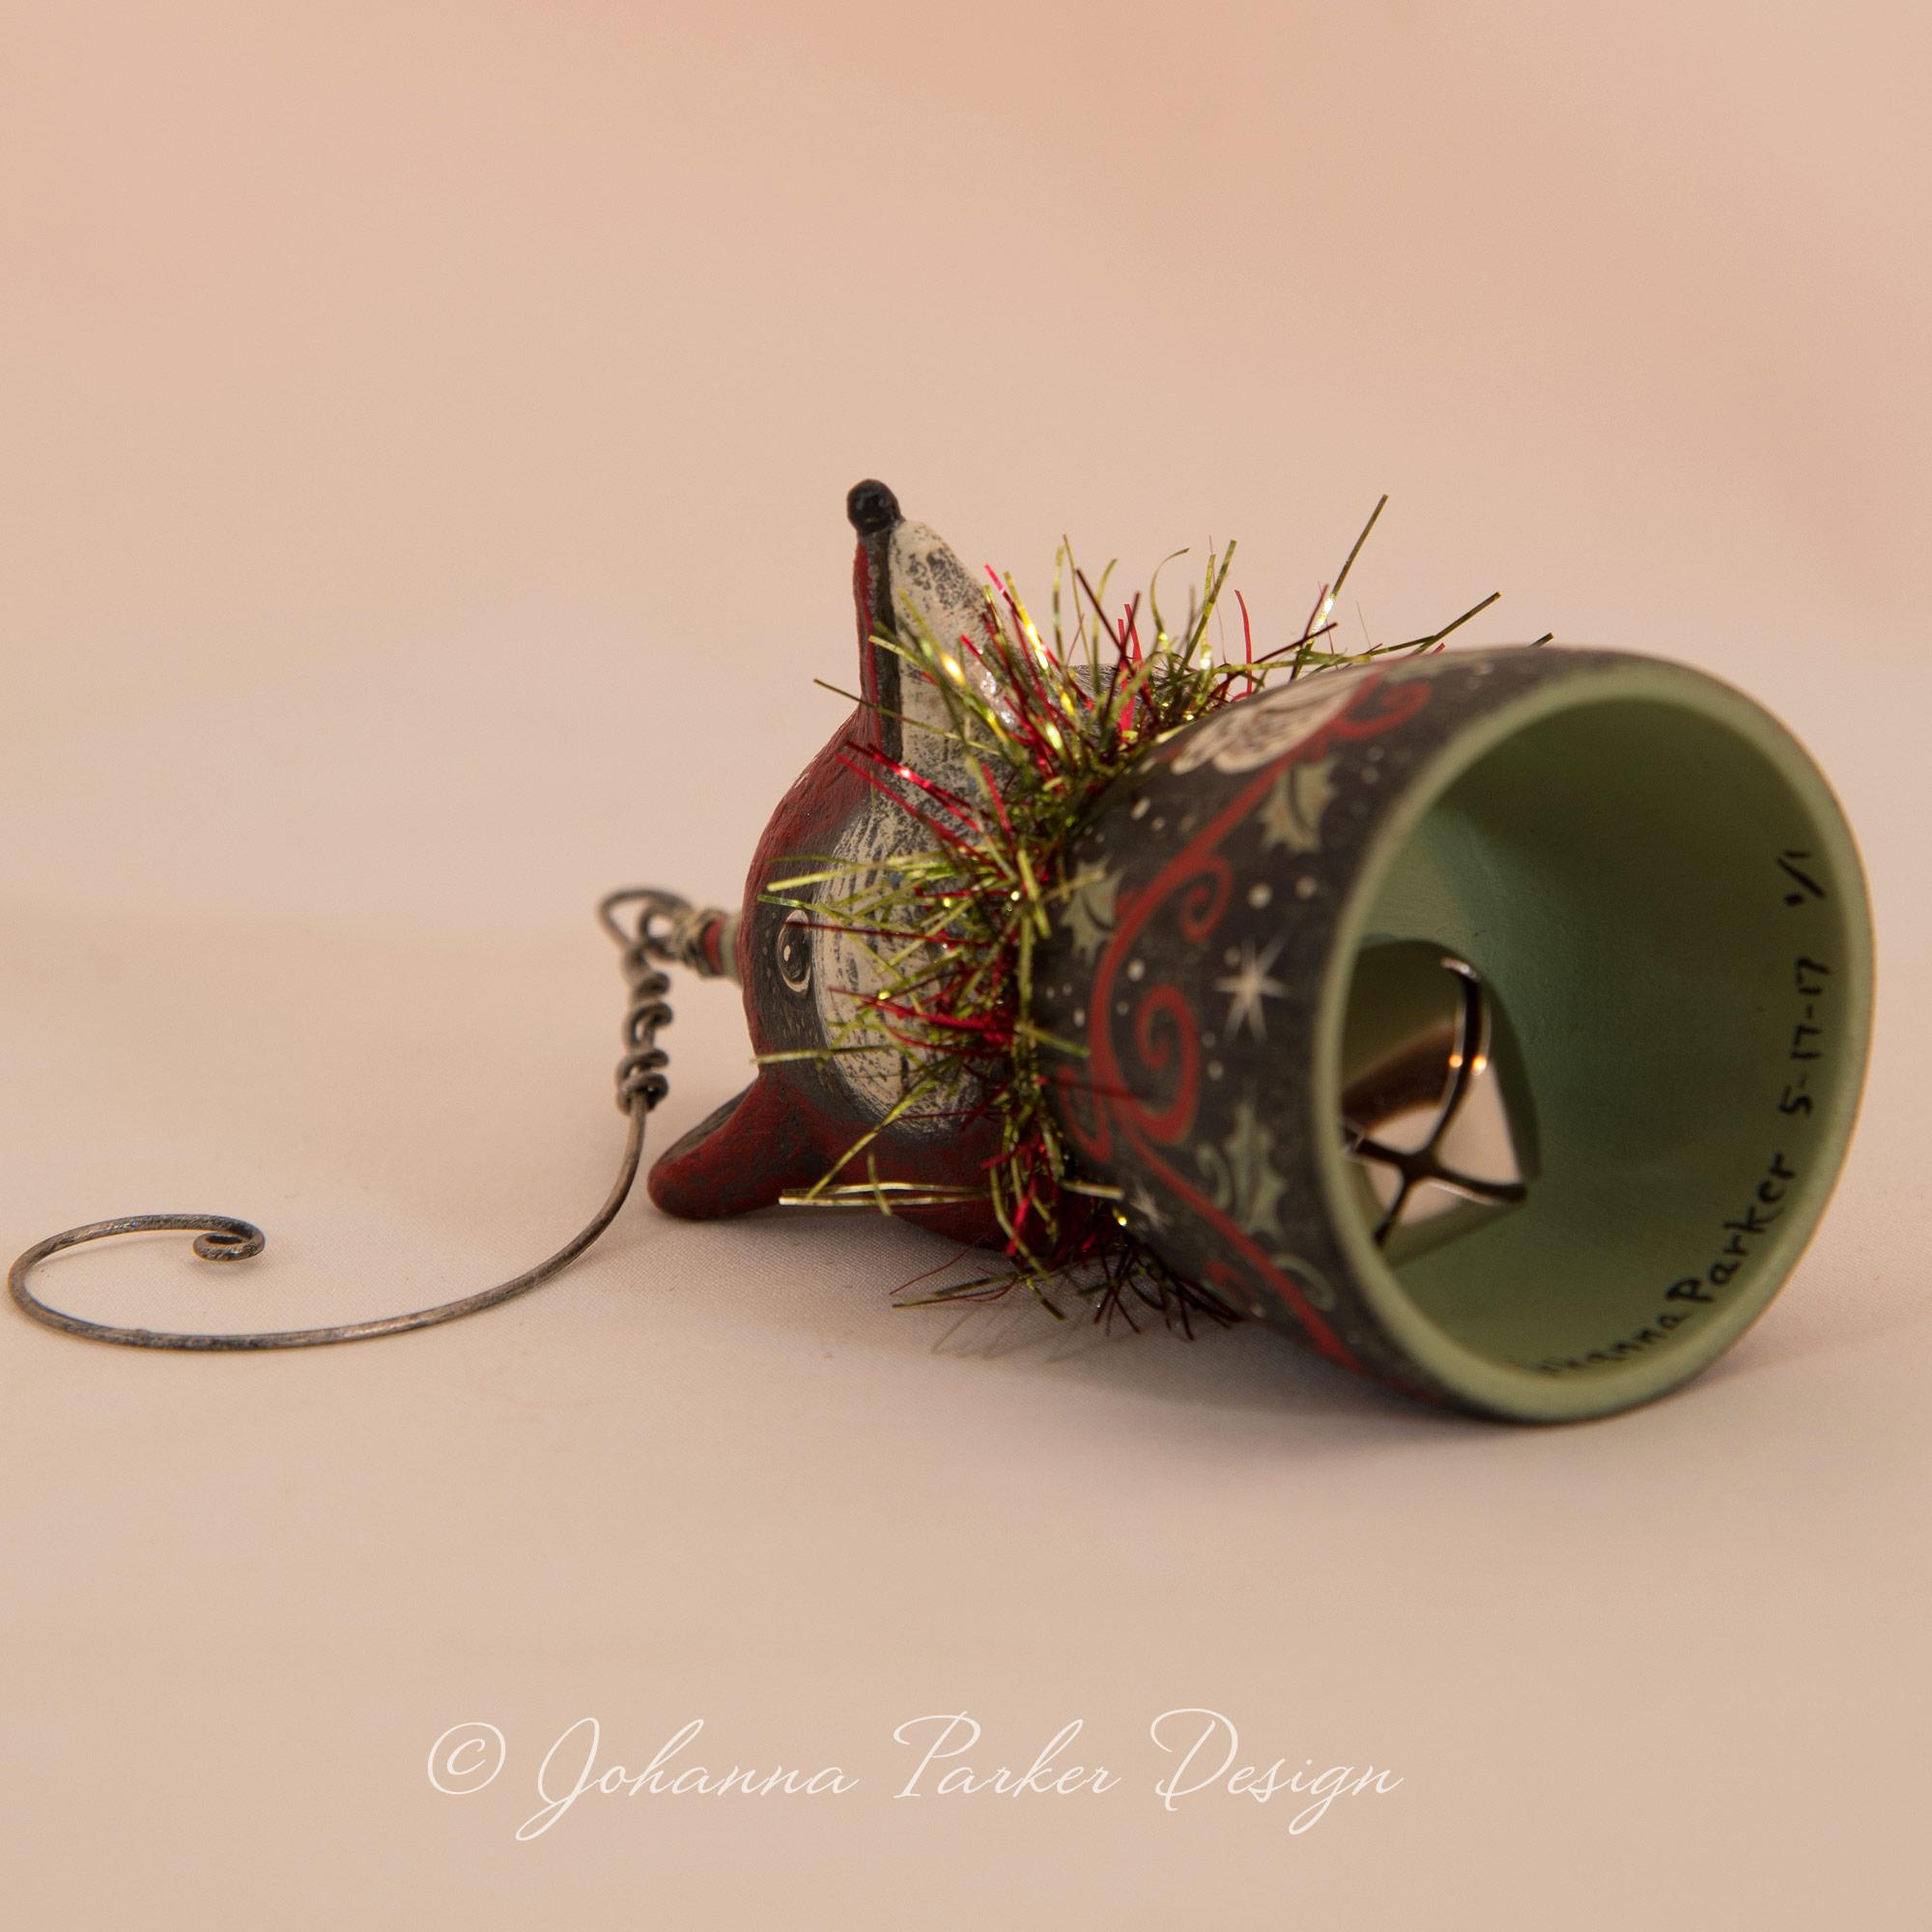 Johanna-Parker-Festive-Fox-Bell-Ornament-10.jpg